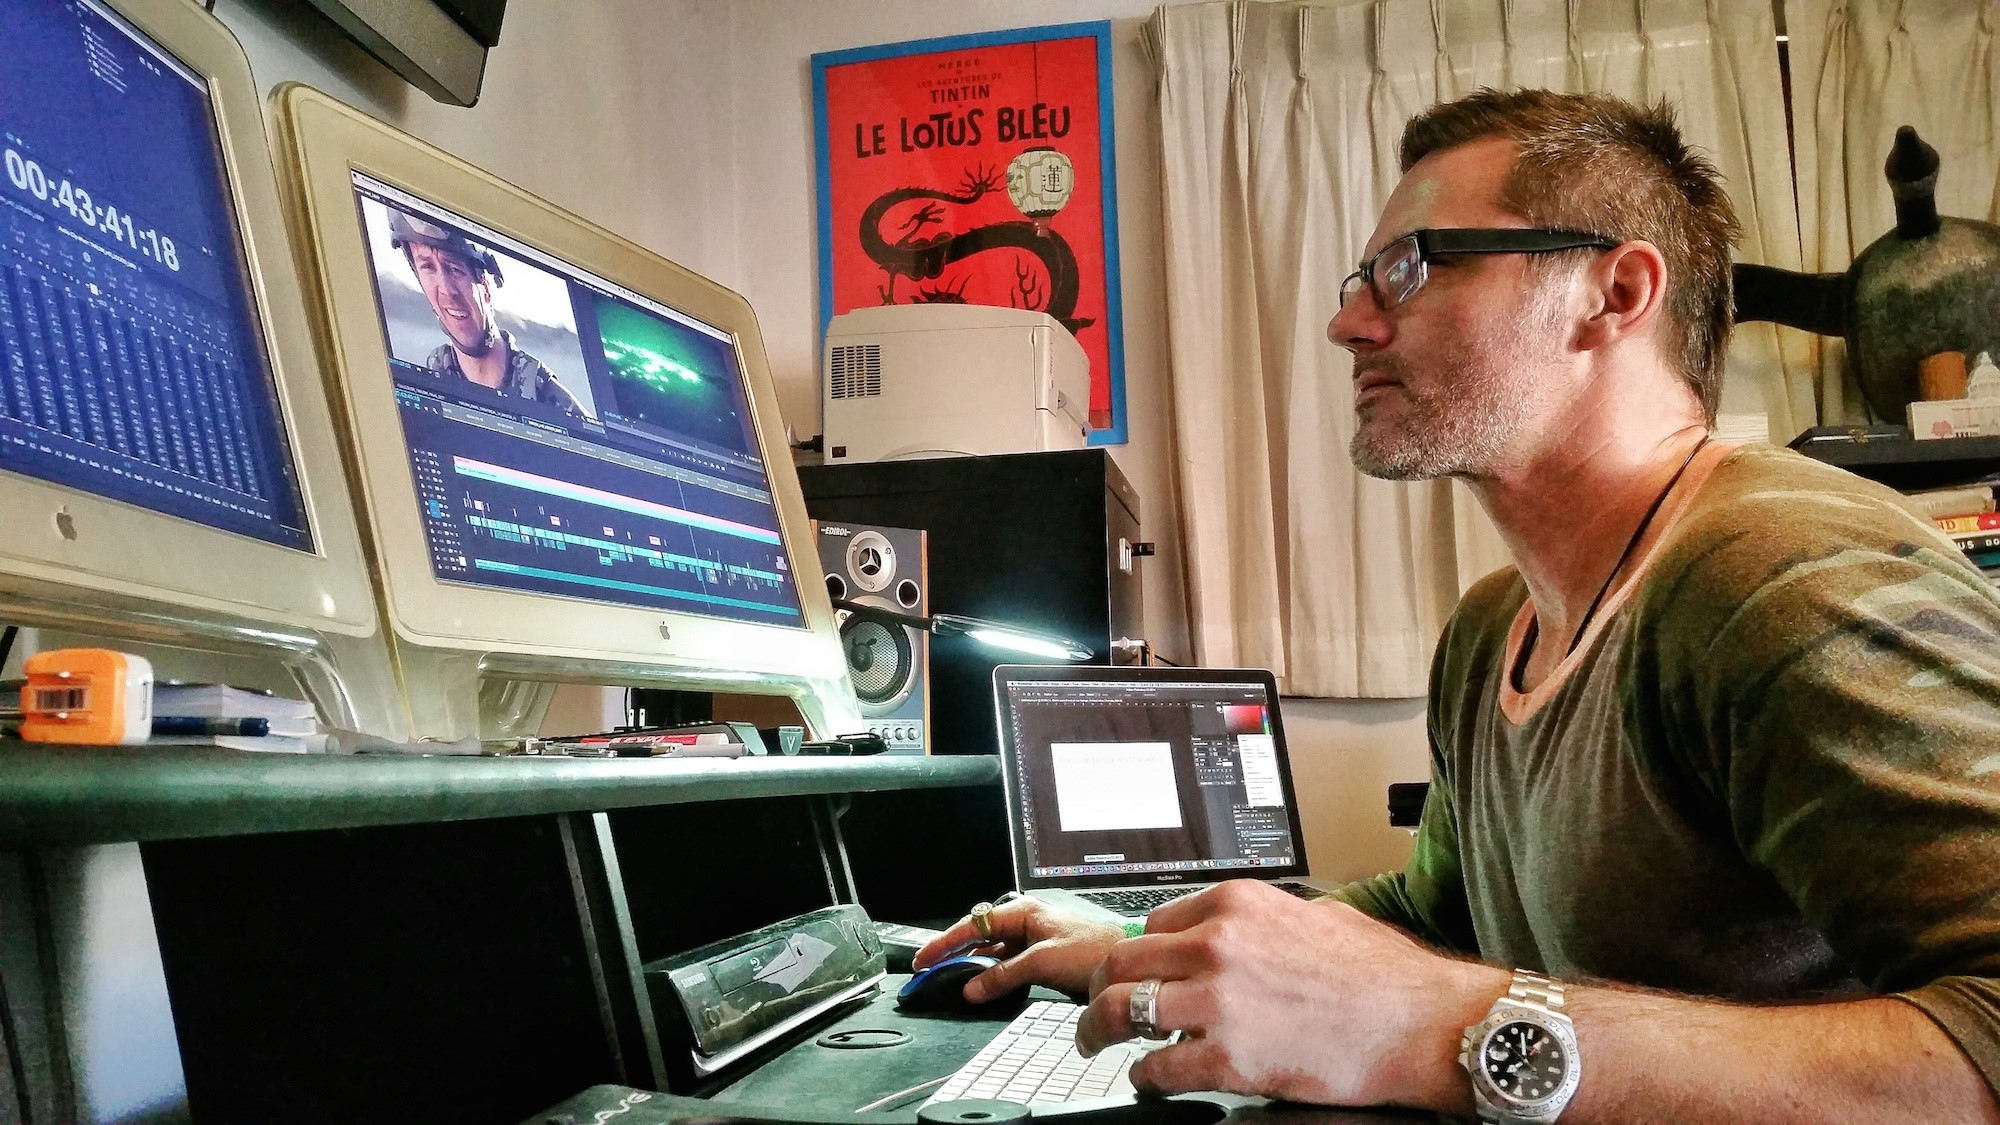 Vashi Nedomansky edits documentary on PTSD with Adobe Premiere Pro CC 13